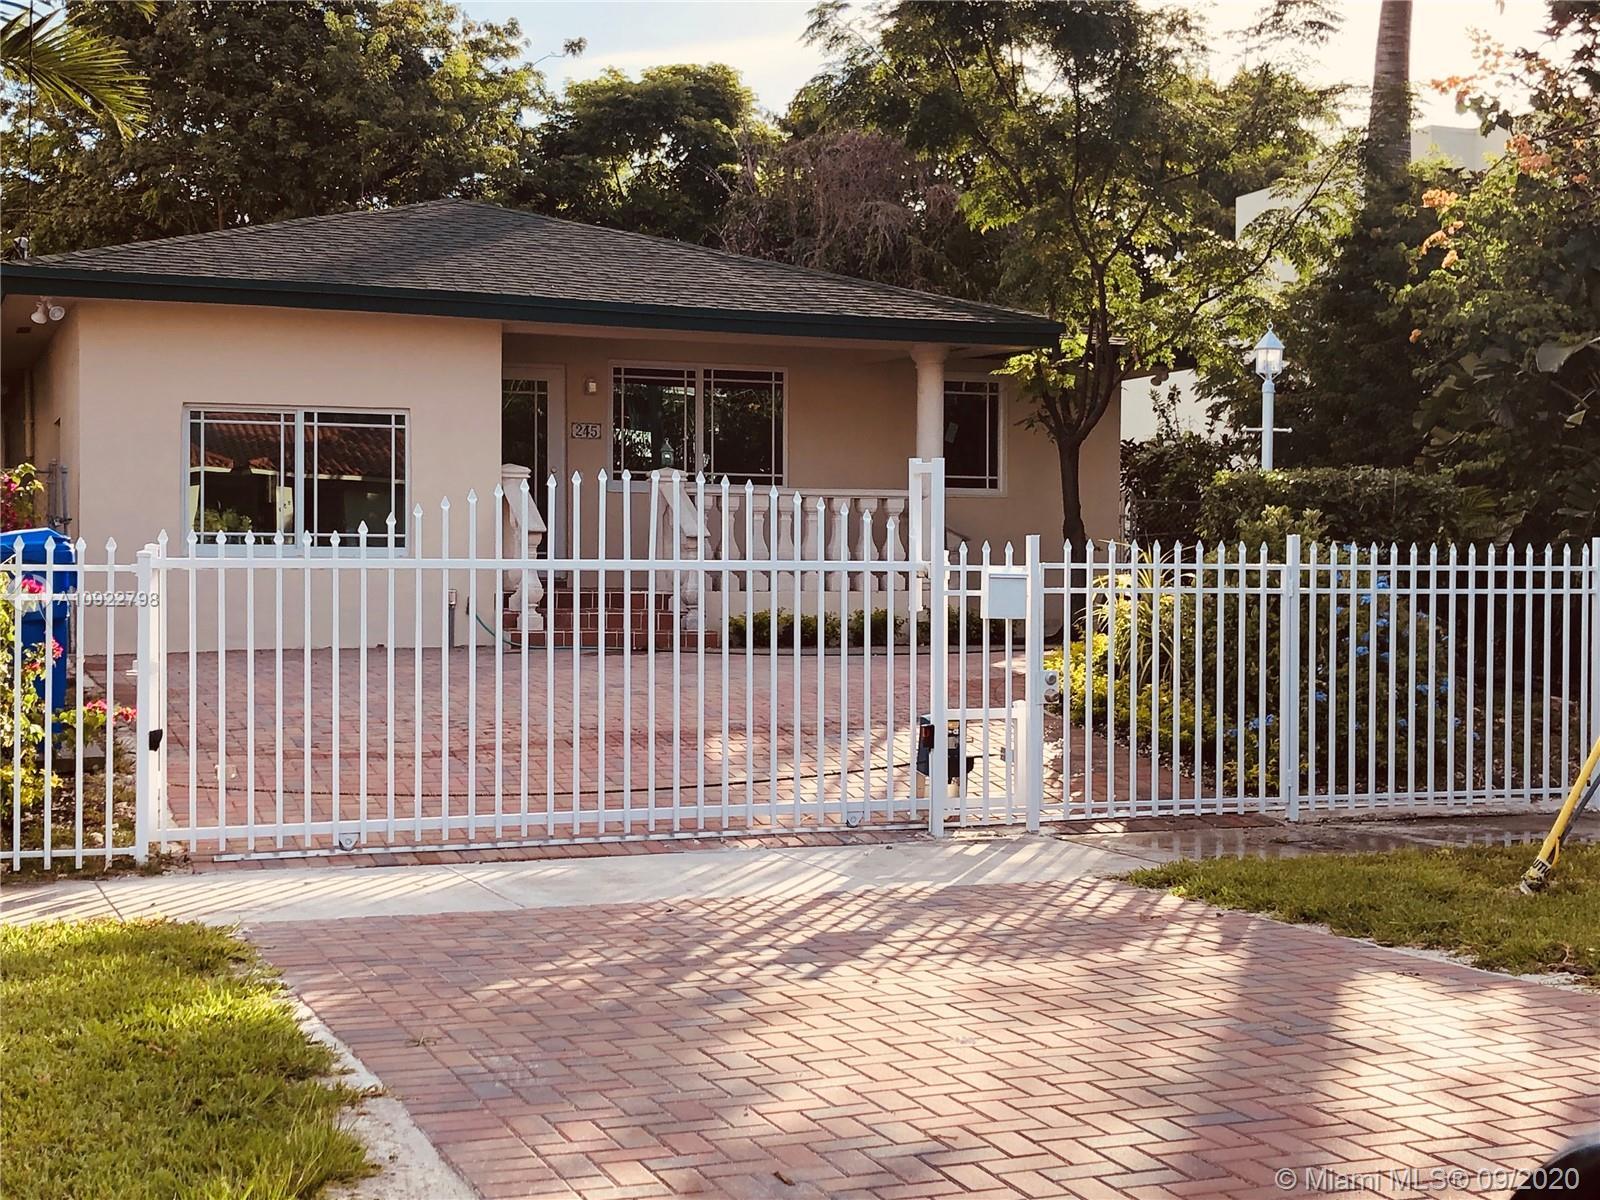 Holleman Park - 245 SW 21st Rd, Miami, FL 33129